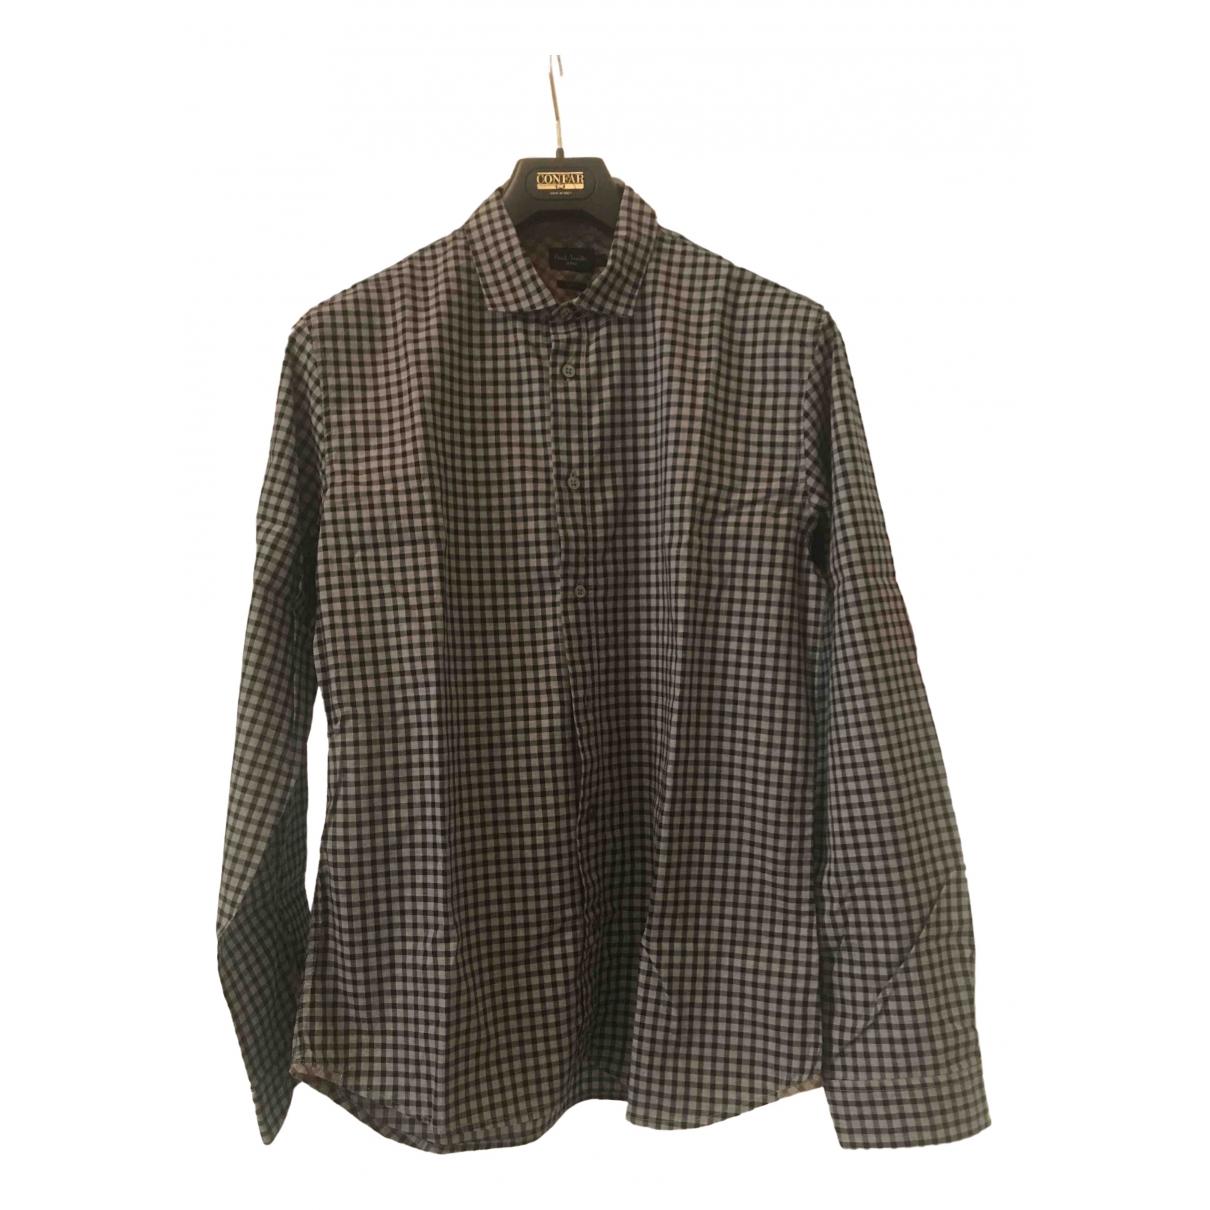 Paul Smith \N Cotton Shirts for Men L International